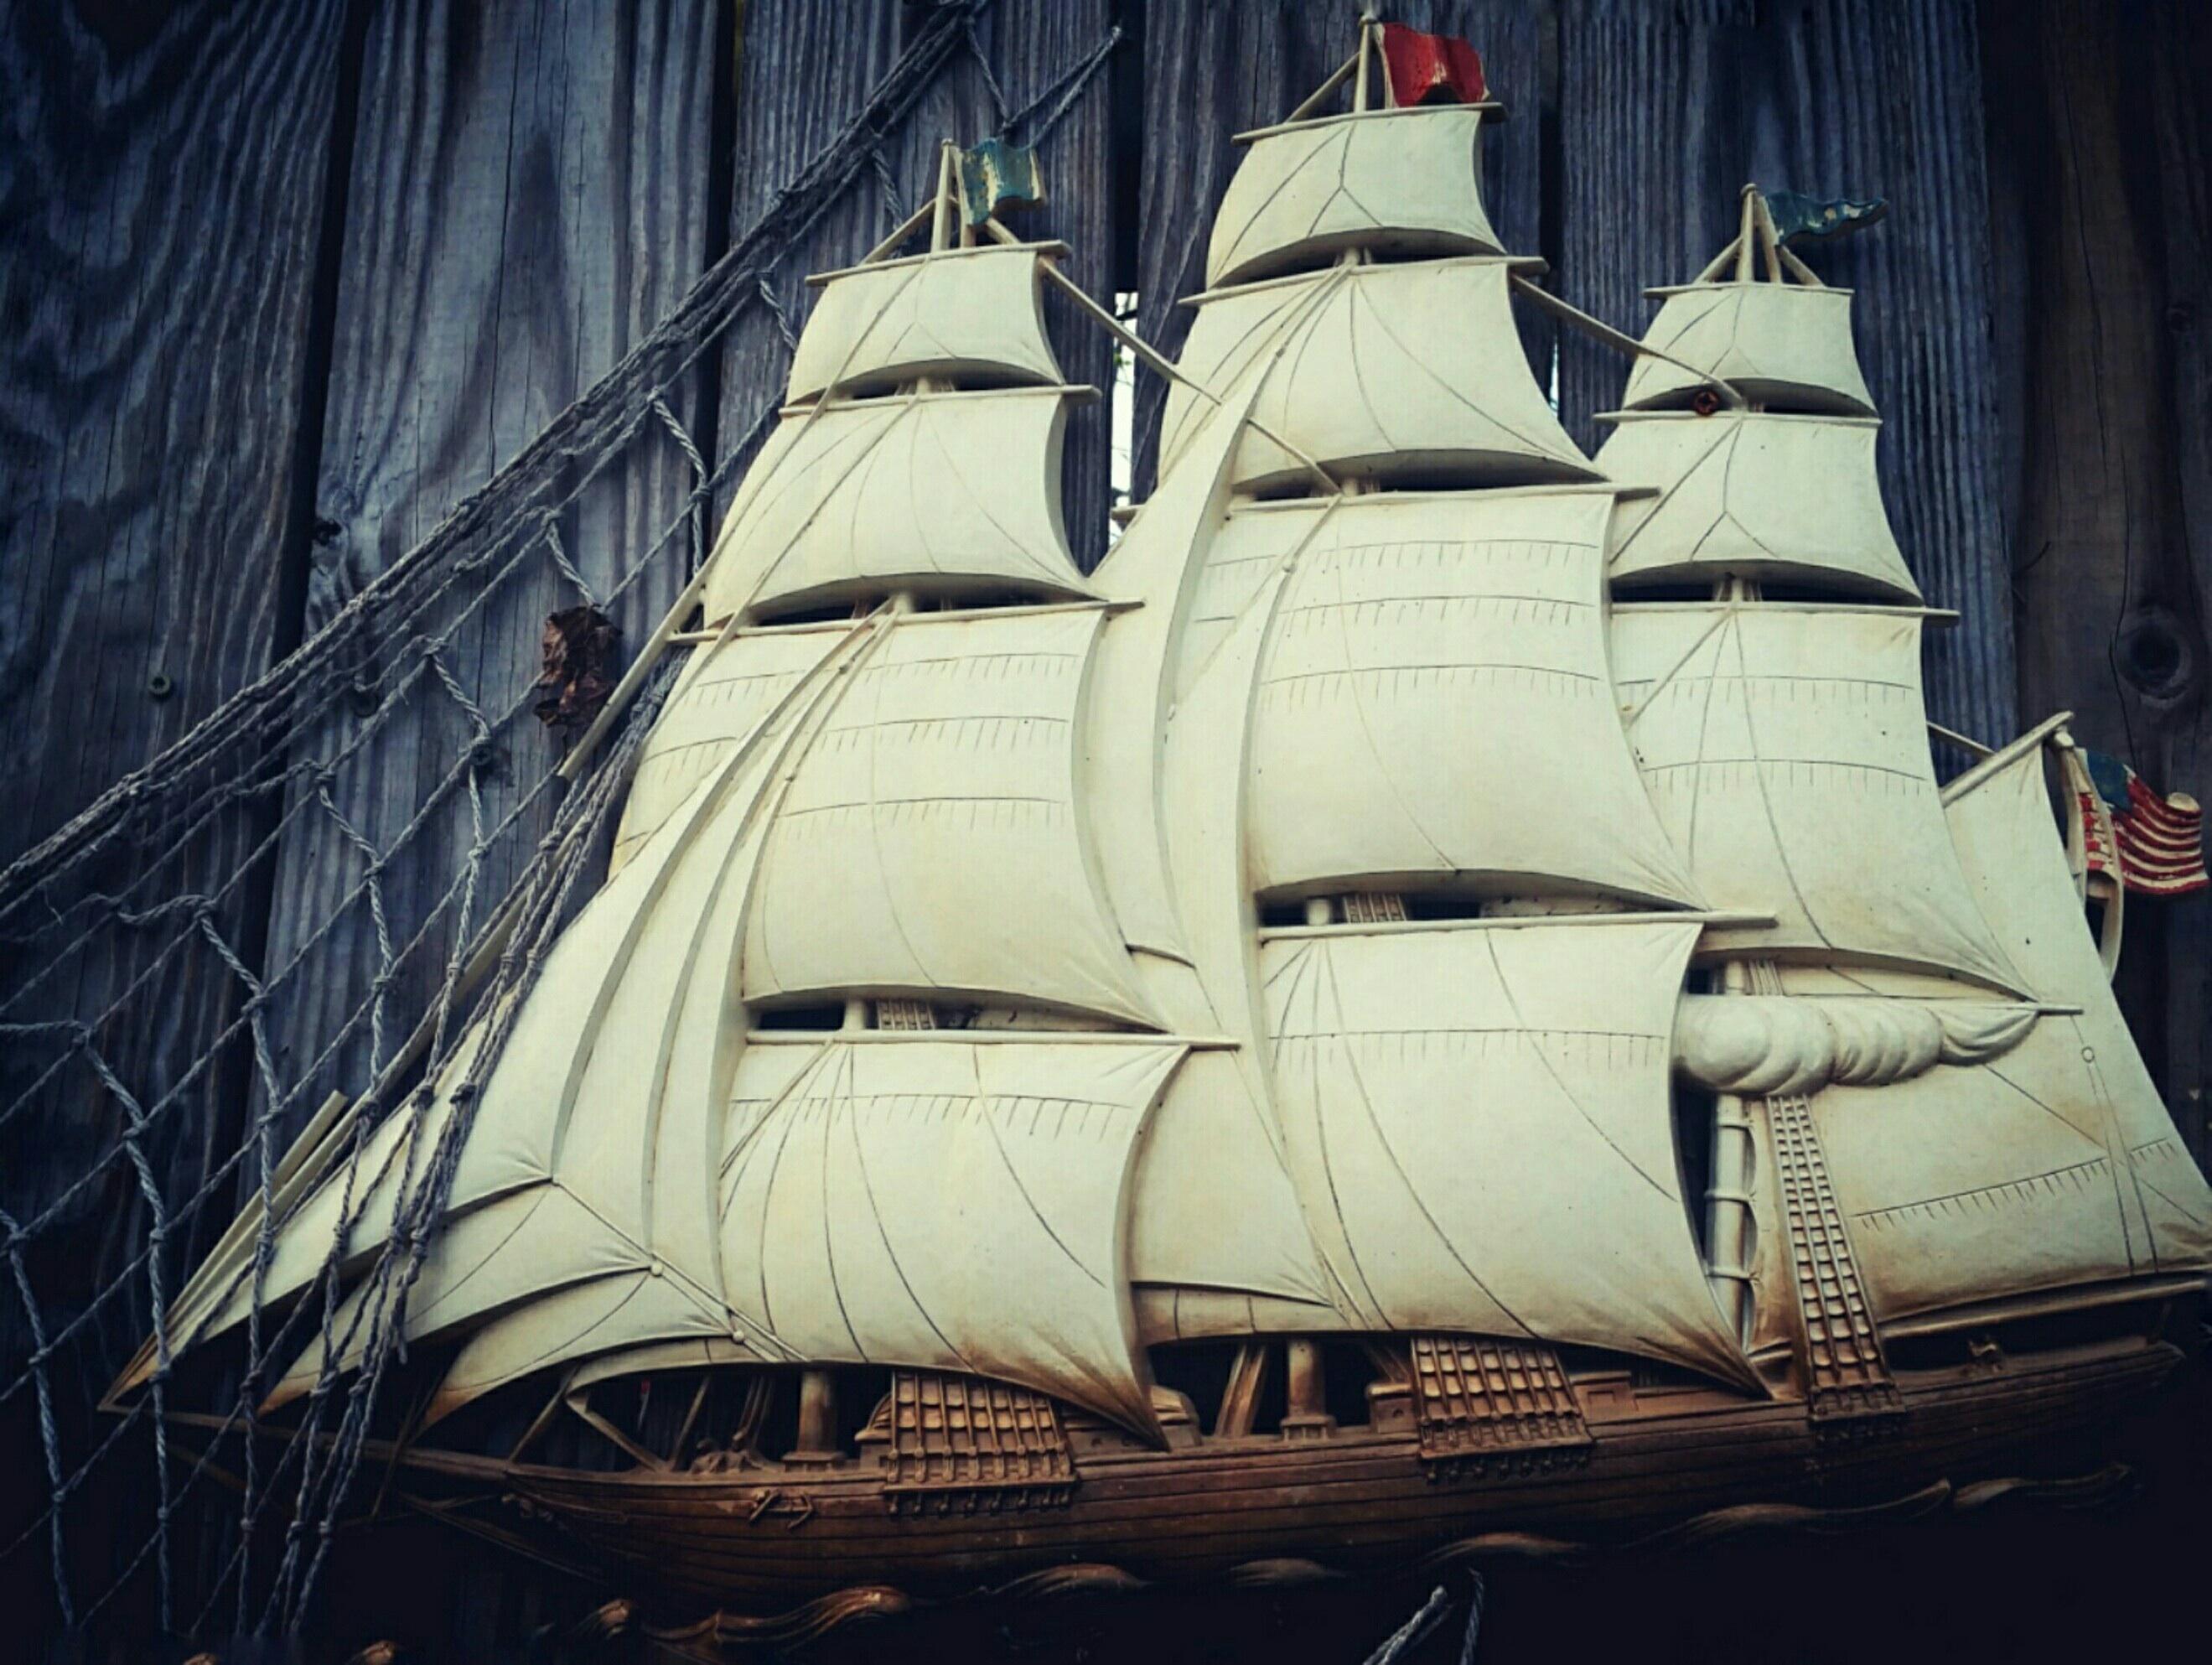 Картинка корабля каравелла